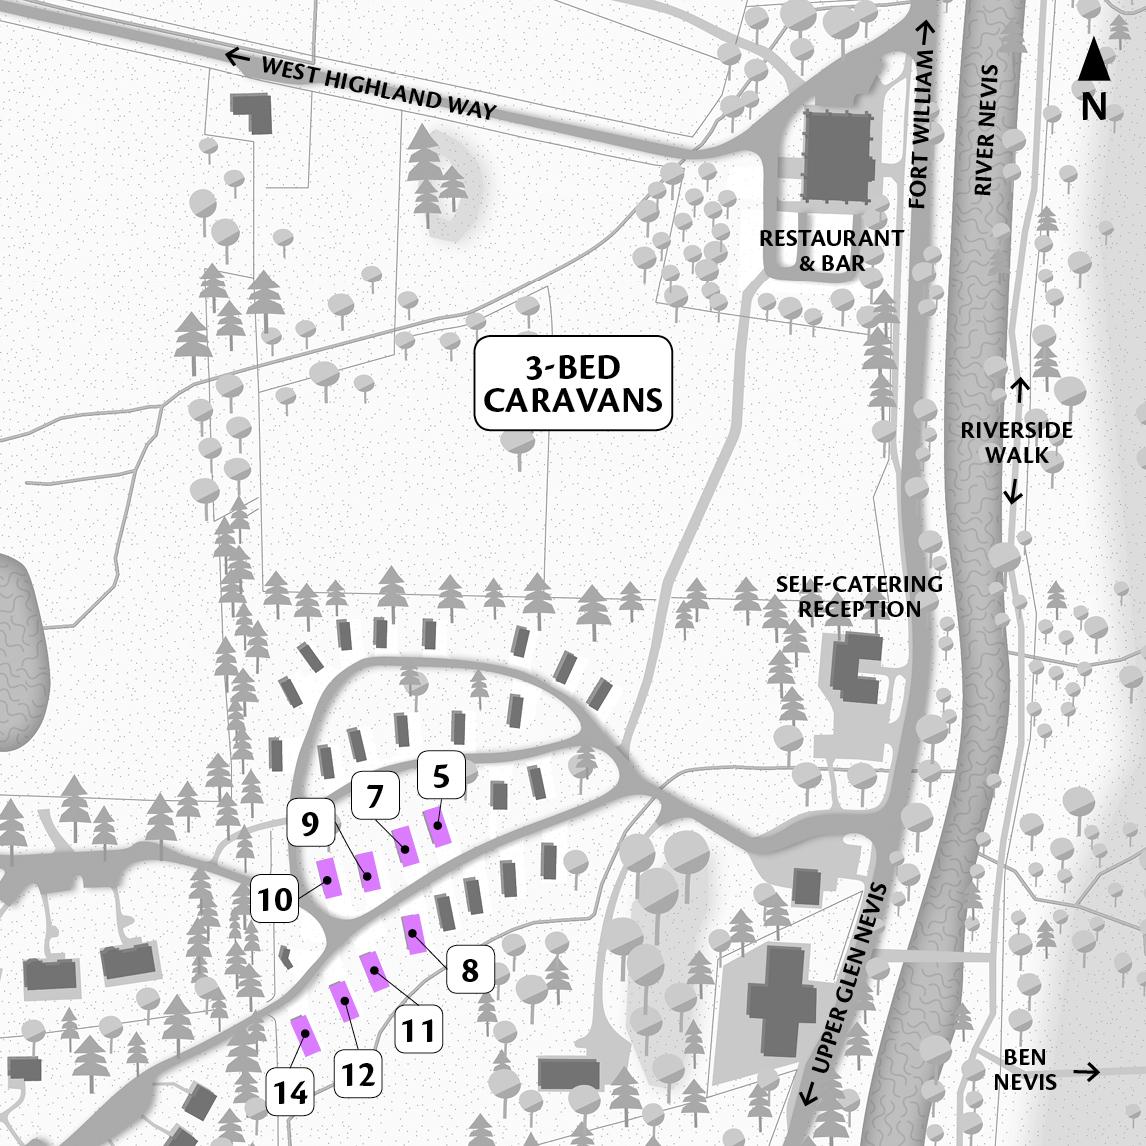 GNH-Map-SelfCatering-WebUnits-Caravan-3Bed.jpg